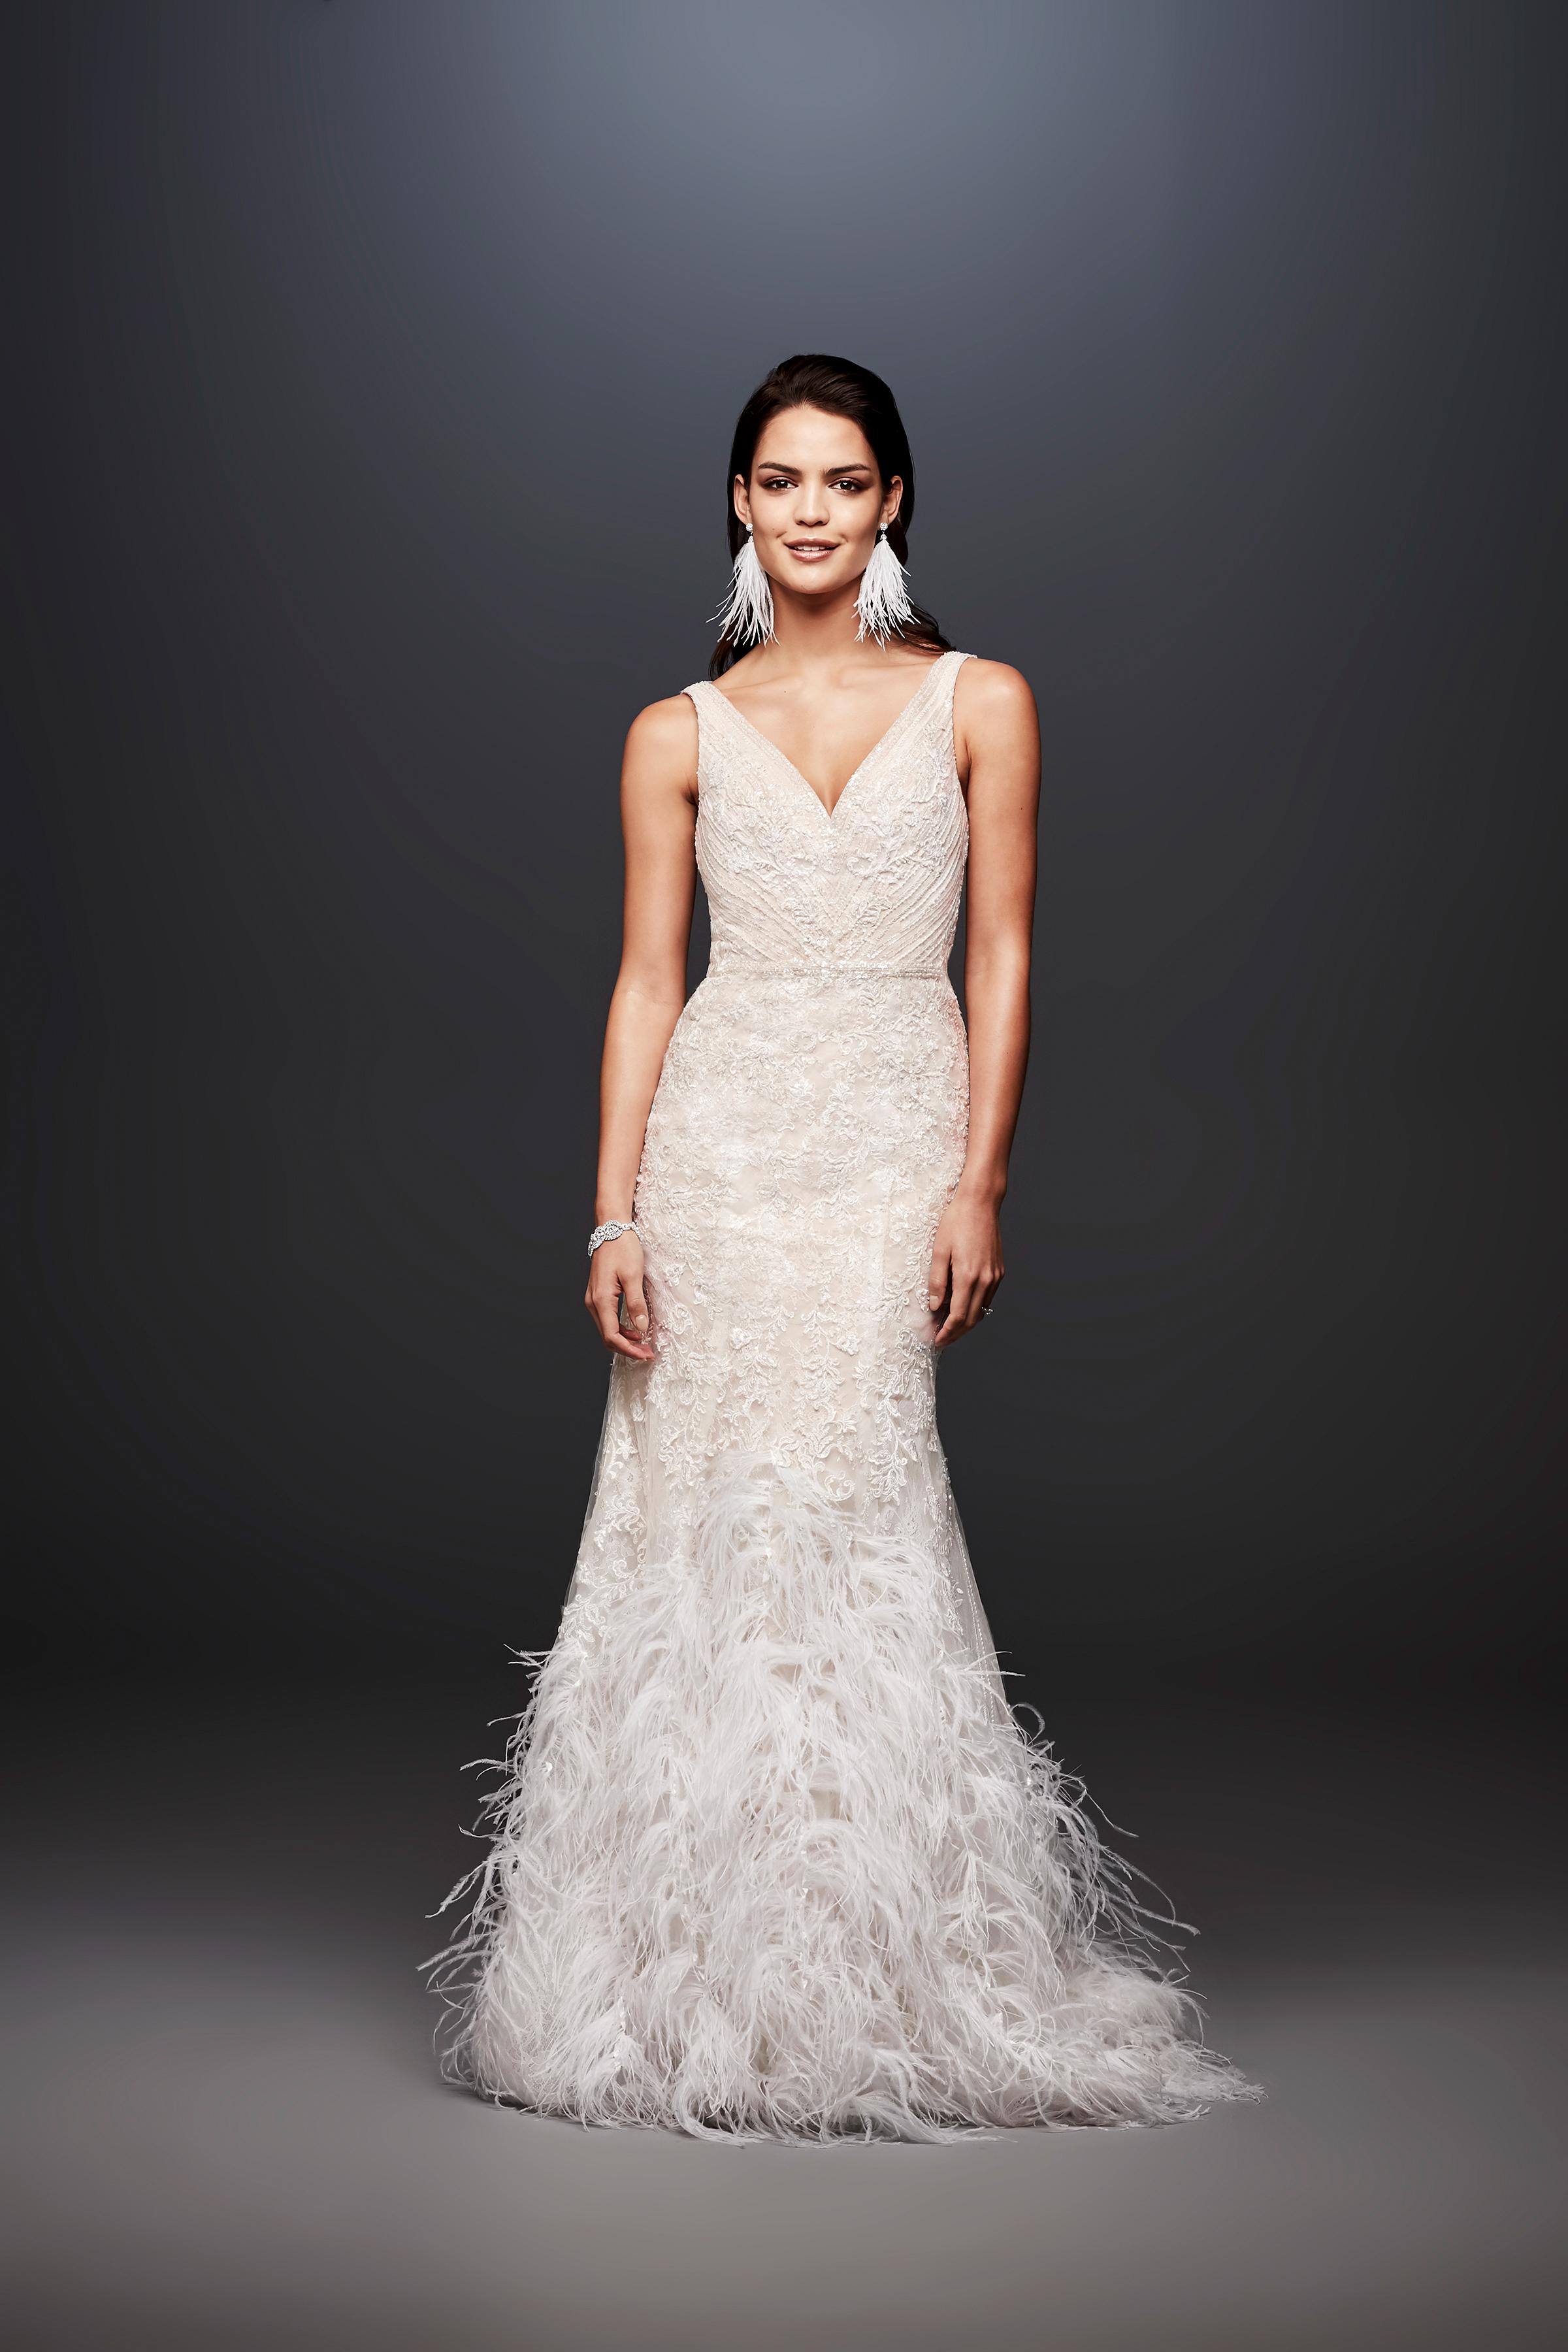 david bridal wedding dress spring 2019 v-neck feathers sleeveless